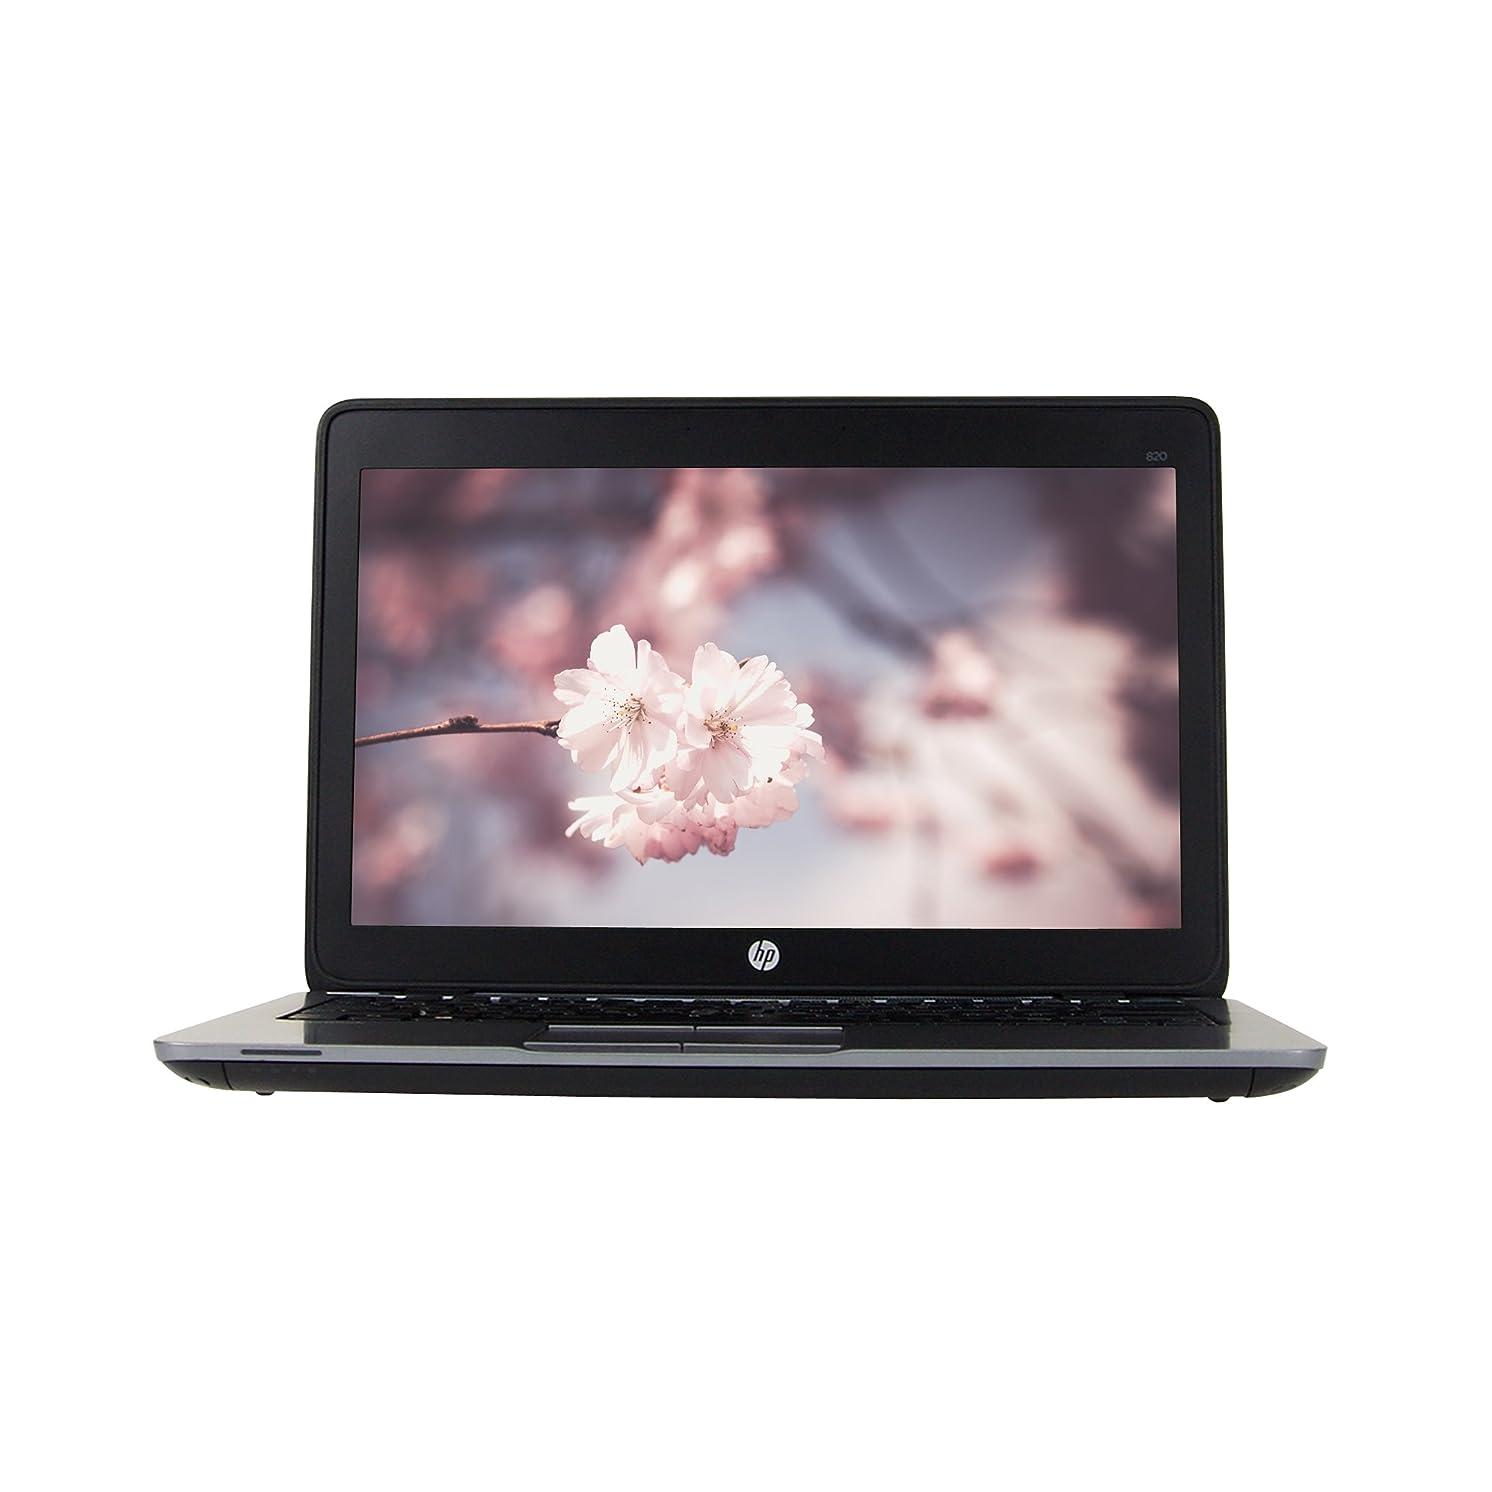 HP EliteBook 820 G2 12.5in Laptop, Core i5-5300U 2.3GHz, 8GB Ram, 480GB SSD, Windows 10 Pro 64bit (Renewed)